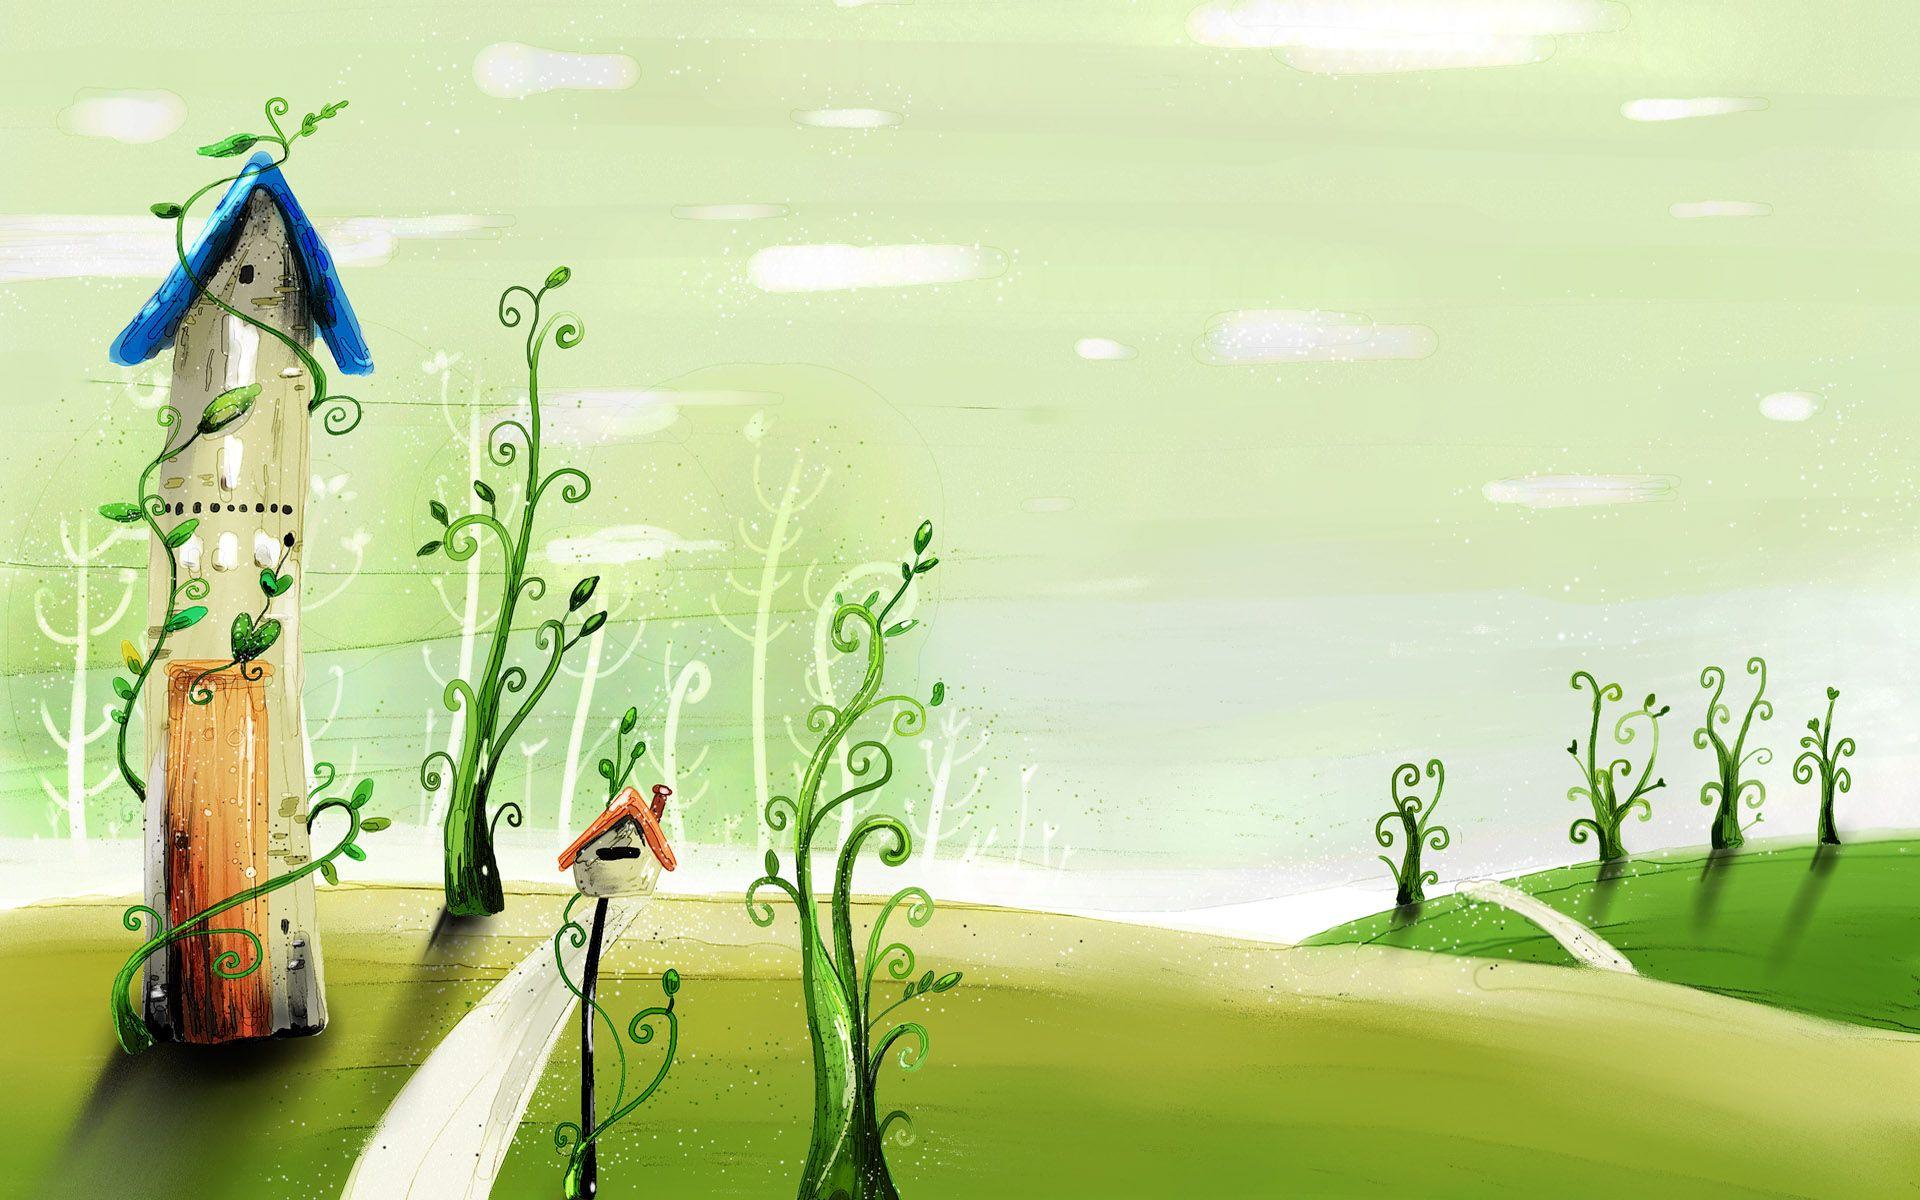 spring fairyland wallpaper for widescreen lcd monitor desktop wallpaper